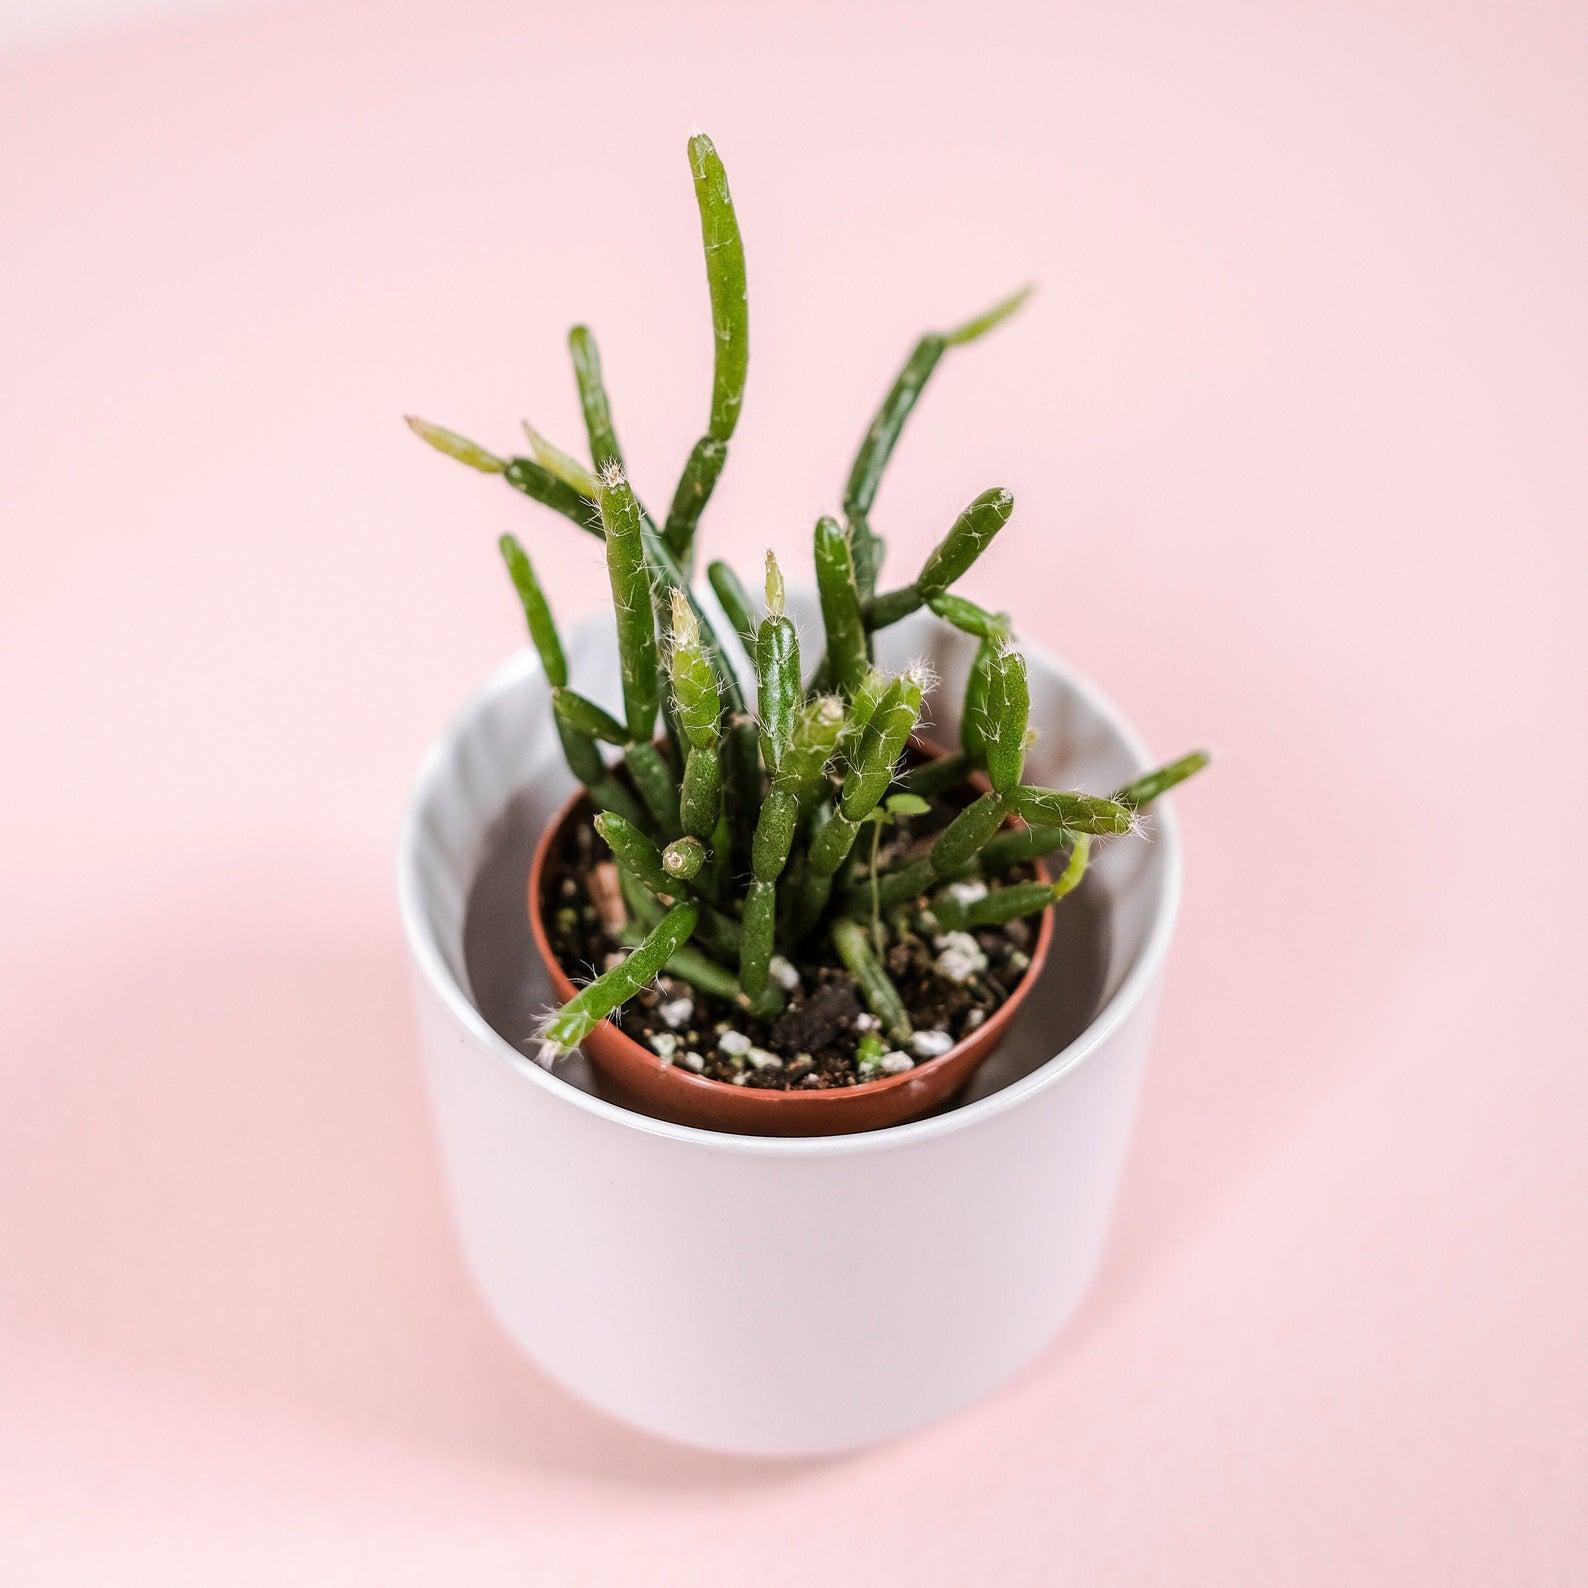 Mitletoe Cactus - Image via Fern Plant Shop (Etsy)